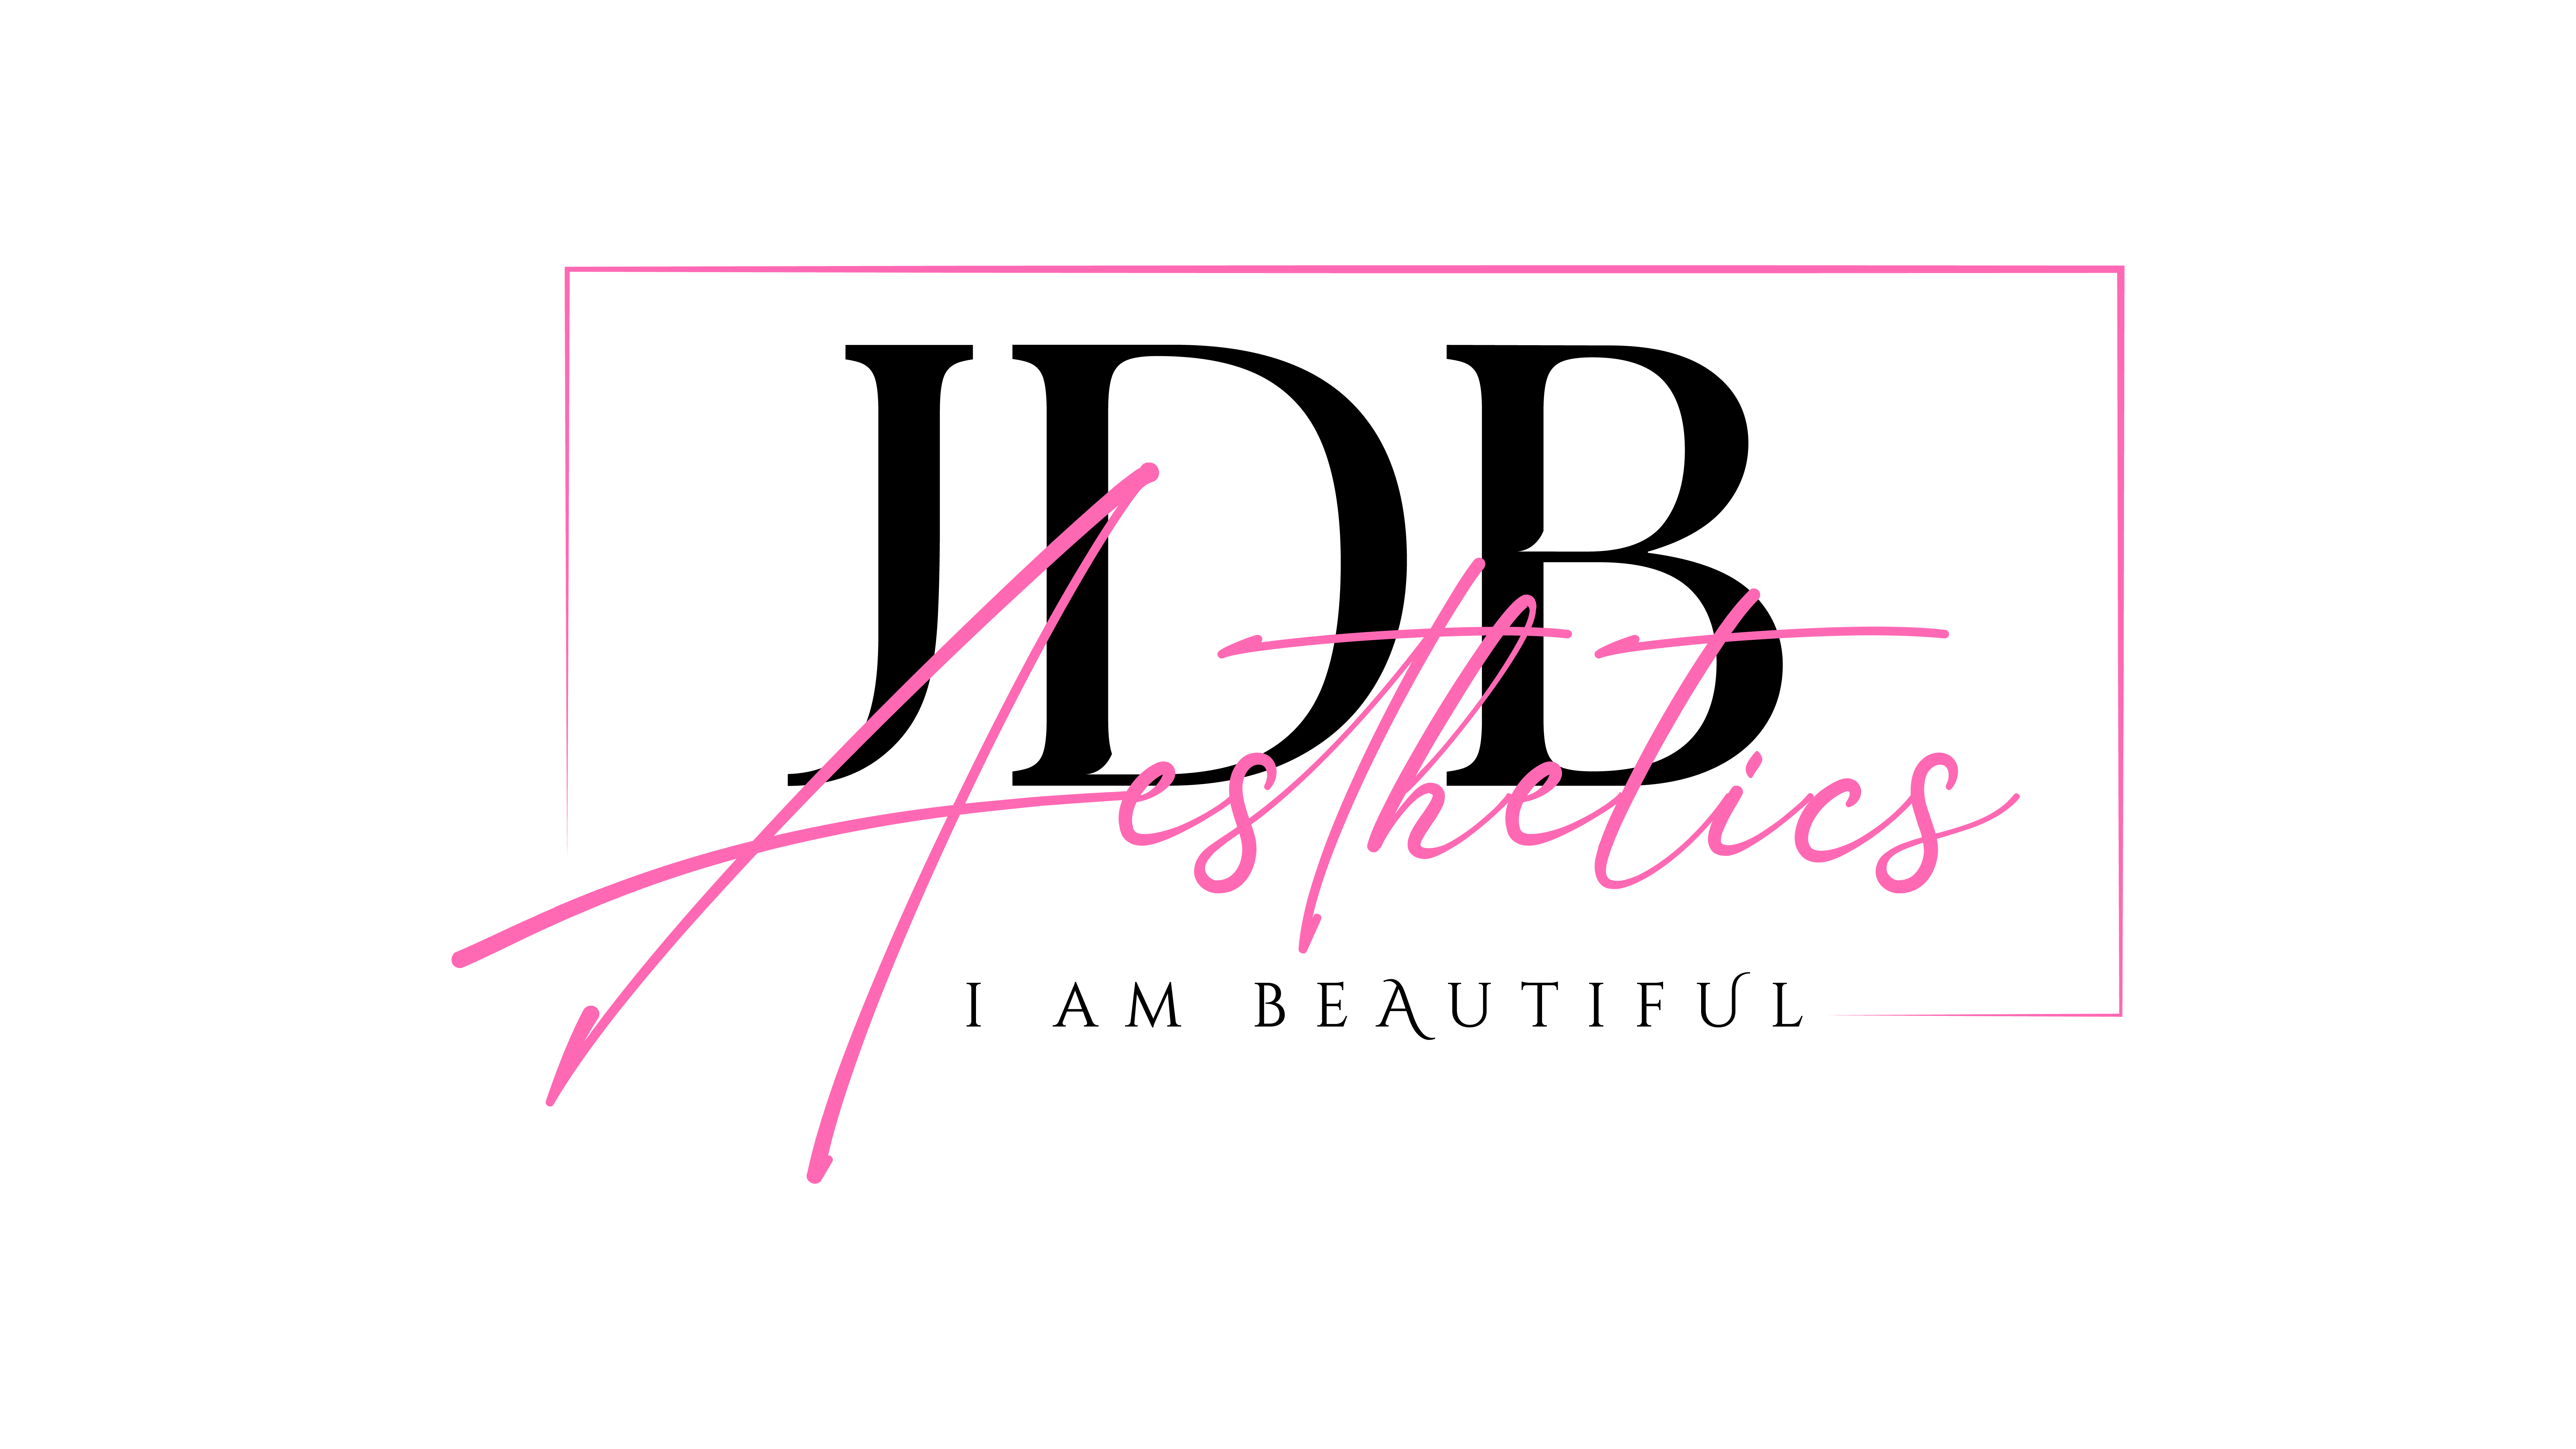 JDB Aesthetics